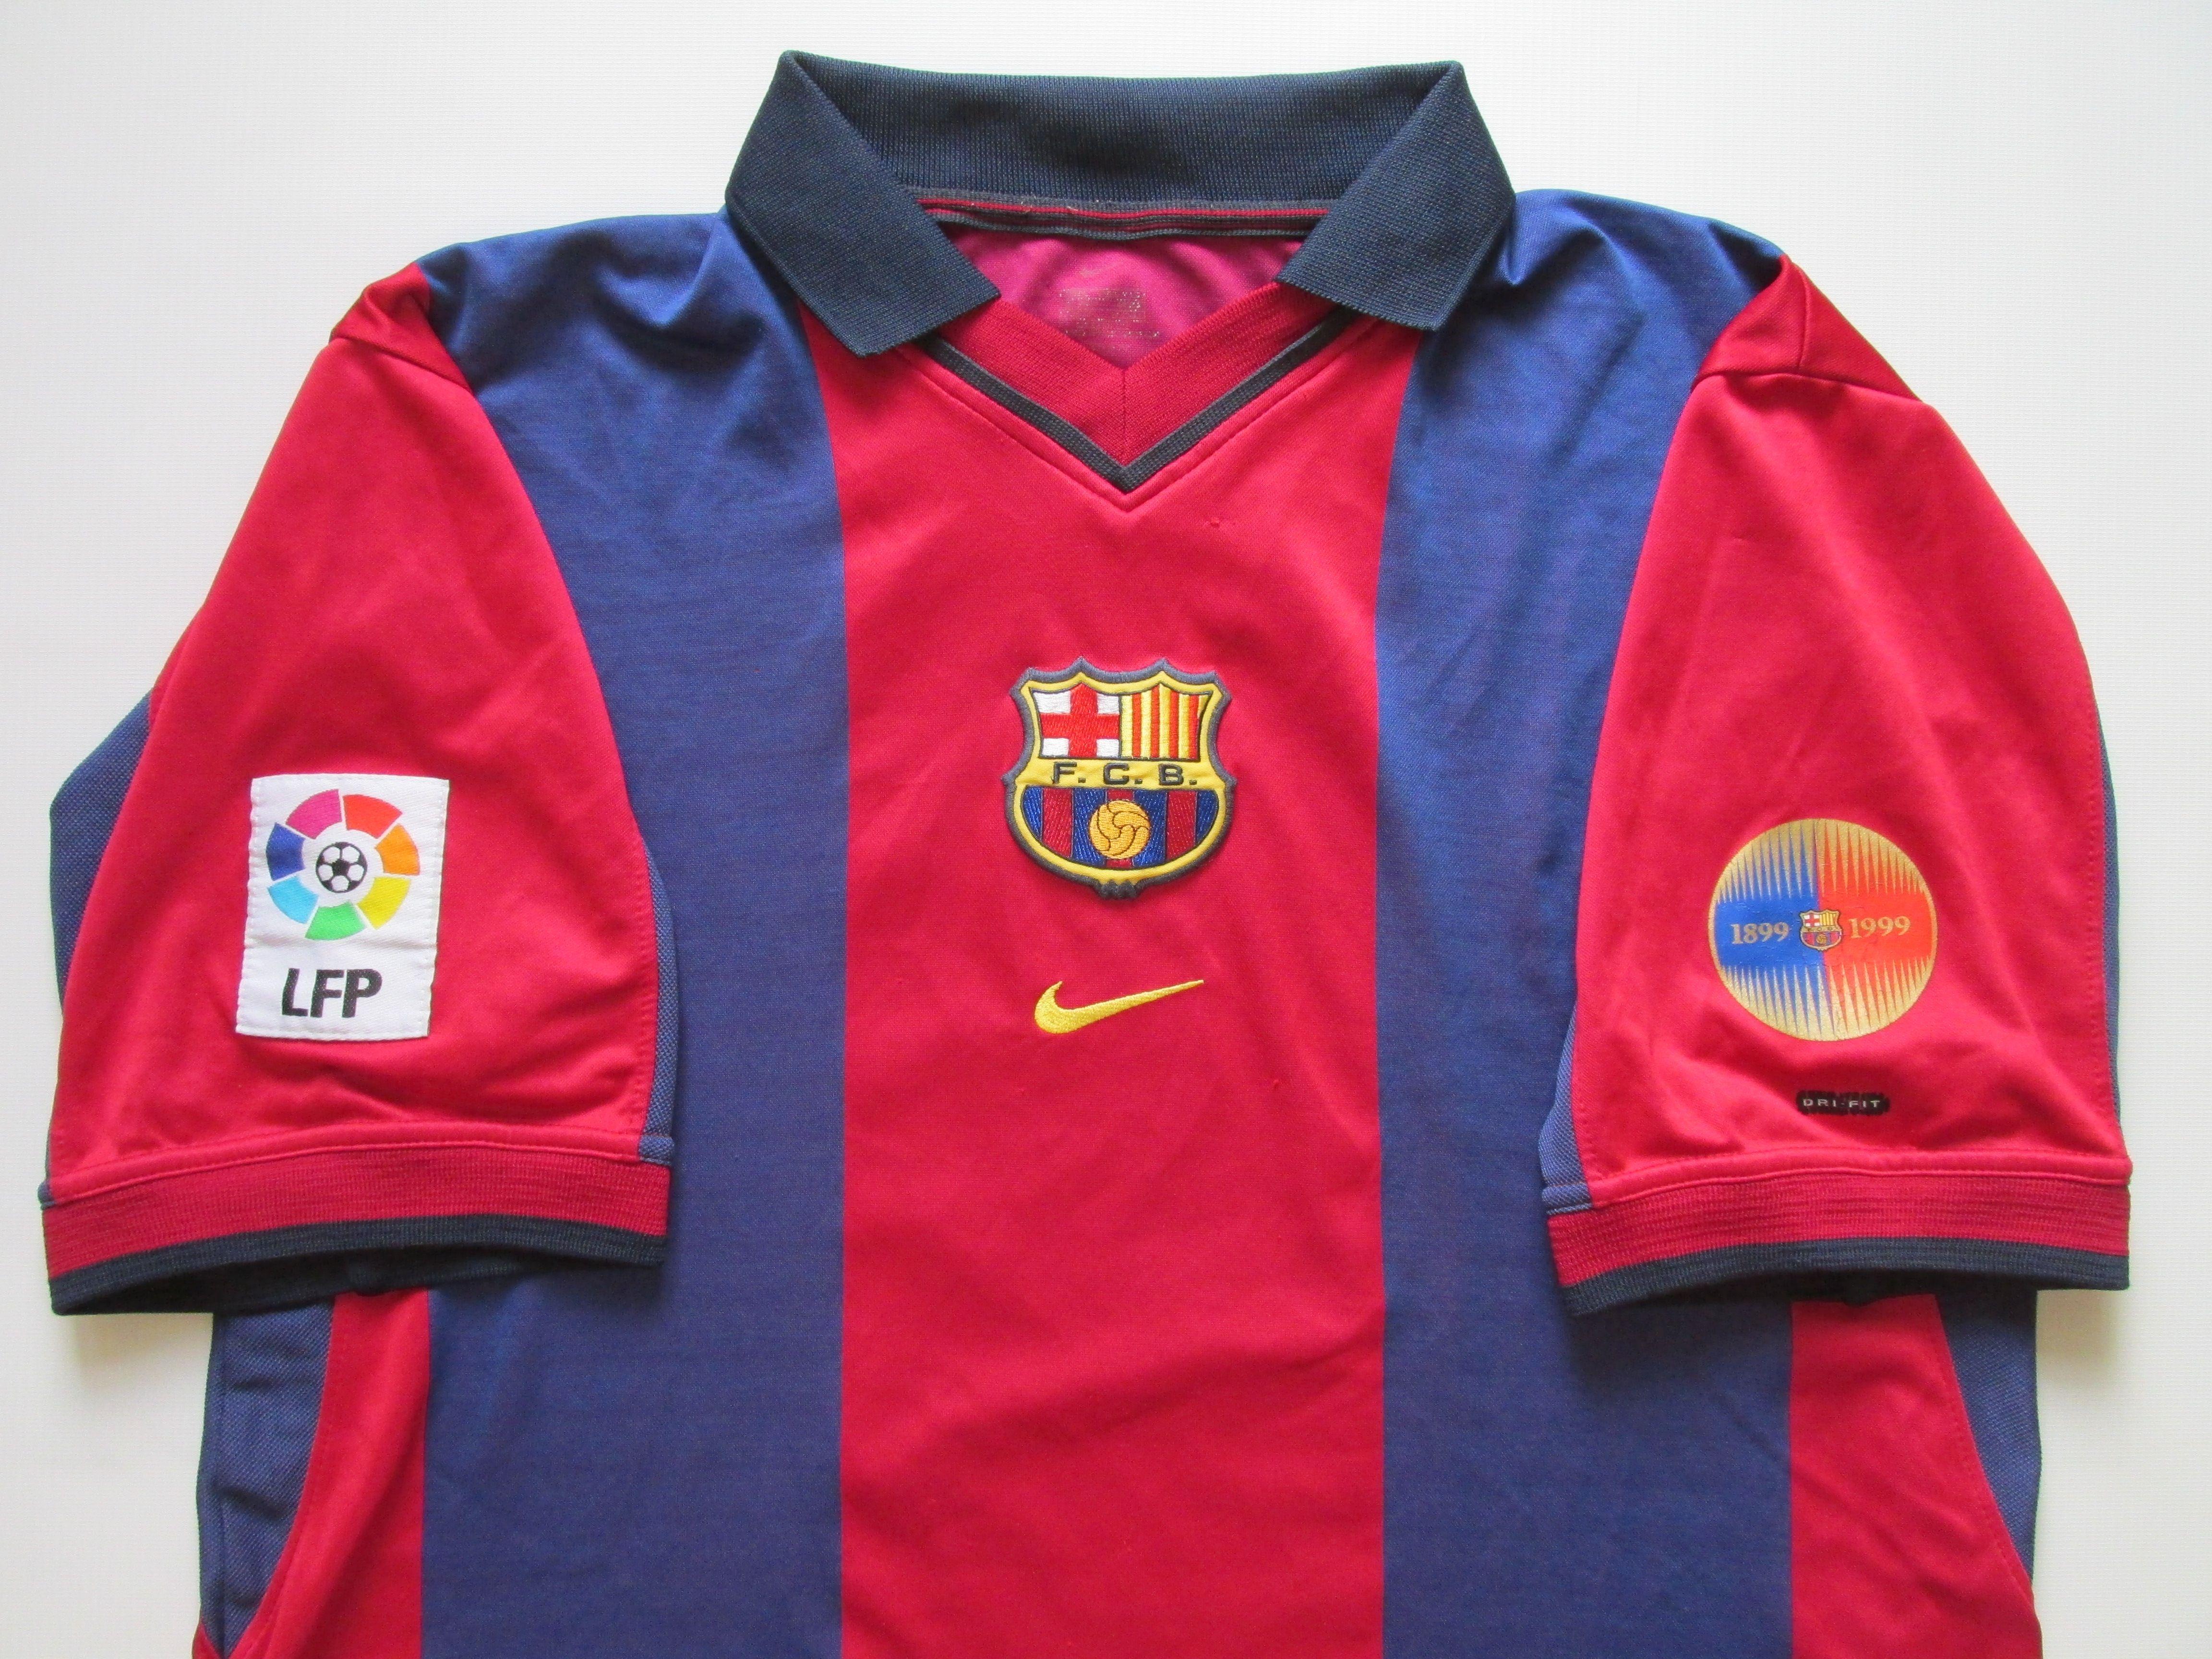 buy popular 1912e 64f52 Barcelona 2000/2001 home football shirt by Nike camiseta ...